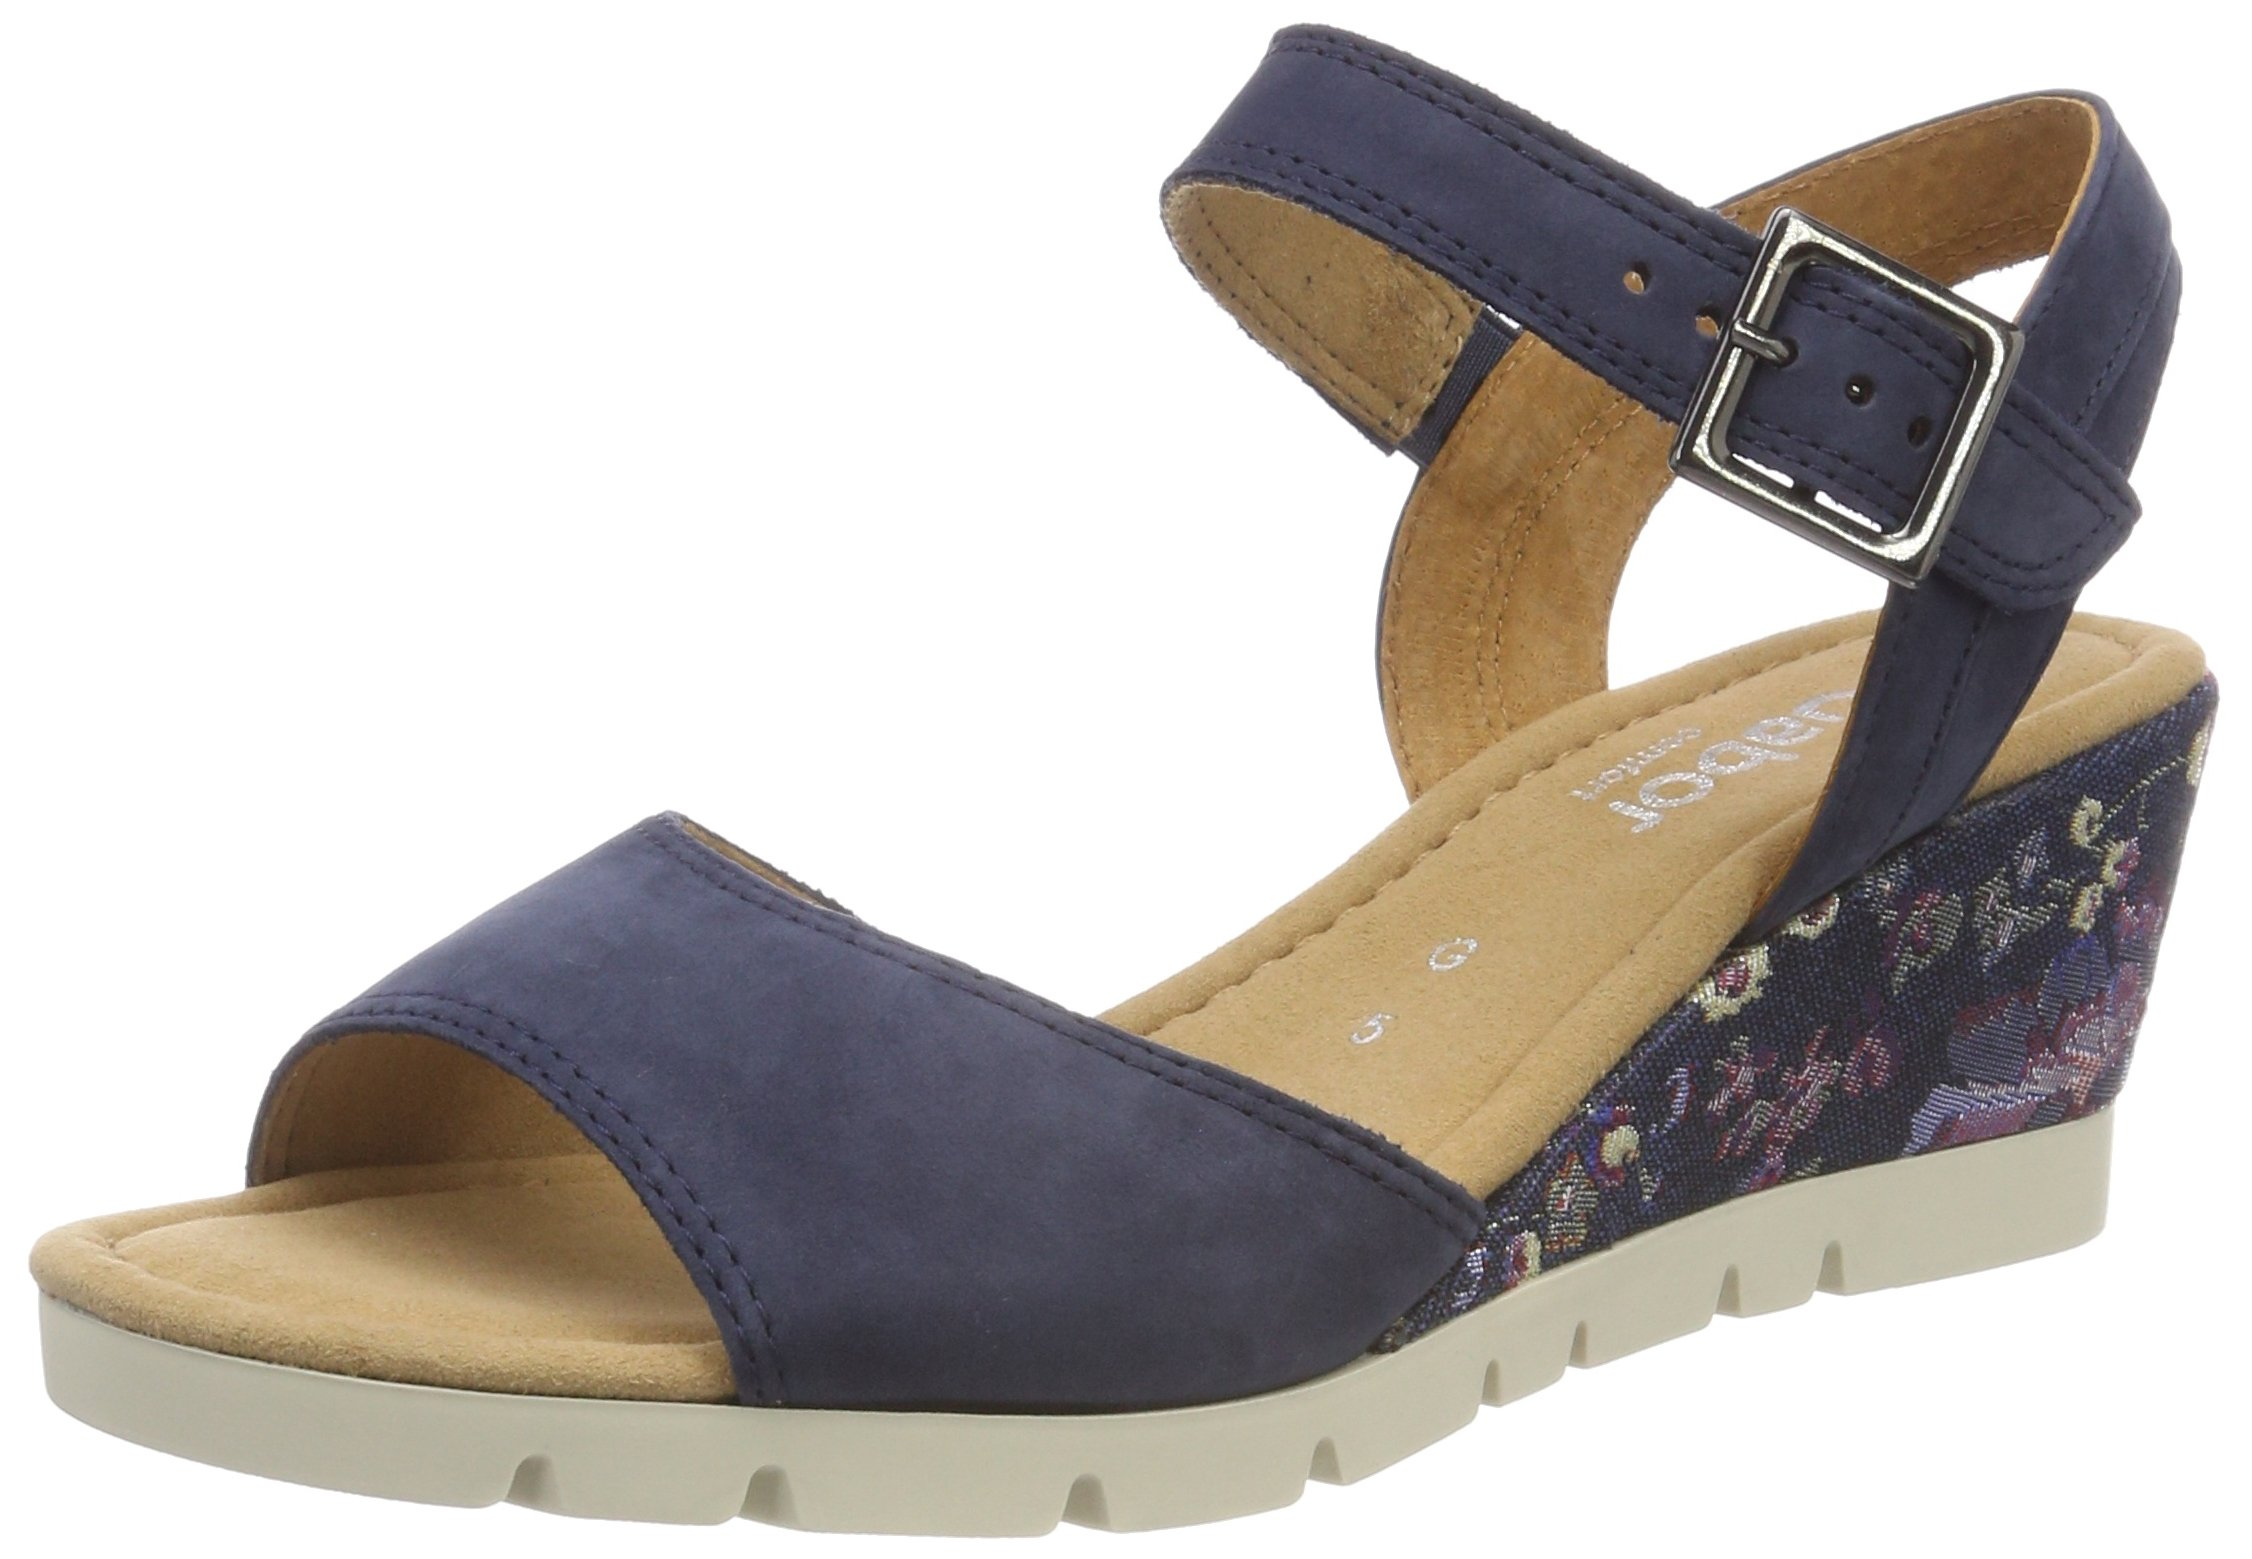 Shoes SportSandales Cheville FemmeBleunavy Flower38 Comfort Eu Gabor Bride nOkw0P